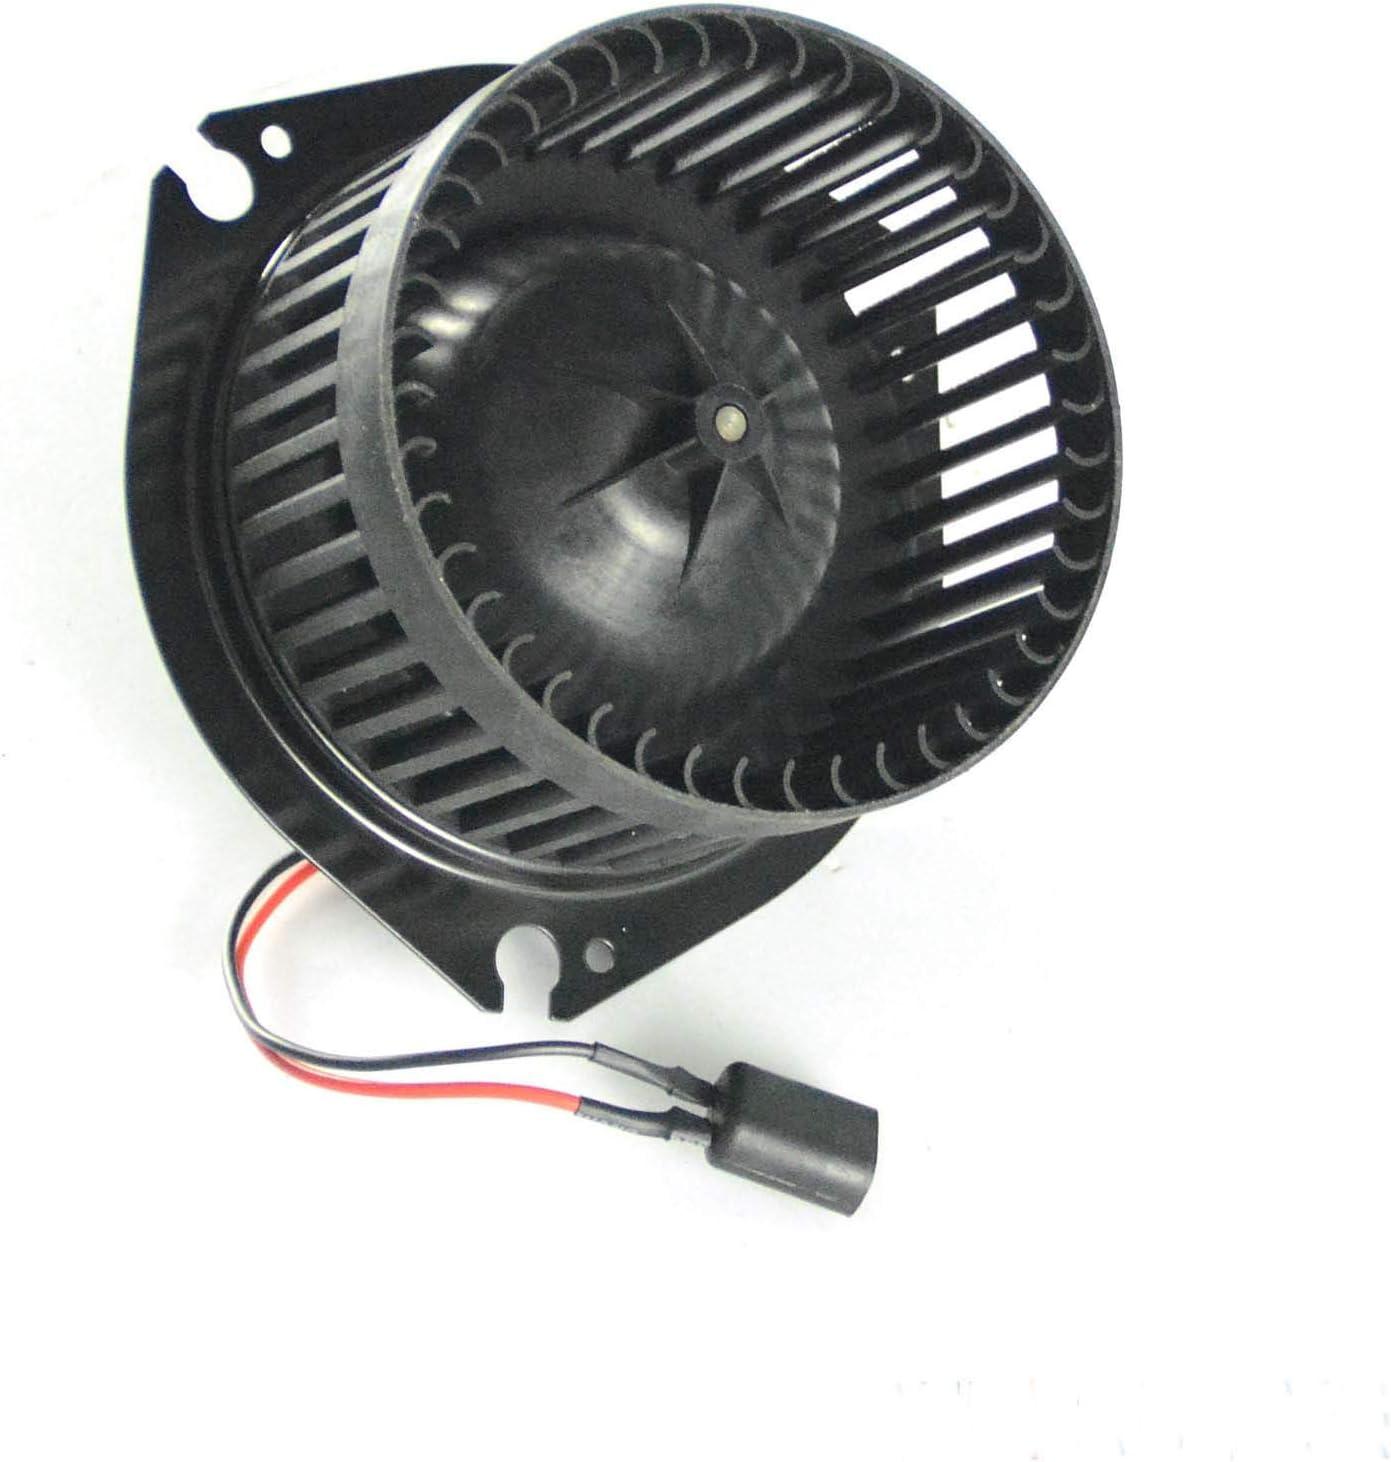 2002 pontiac grand prix hvac blower wiring amazon com showsen pm2714 hvac ac heater blower motor fit 97 04  hvac ac heater blower motor